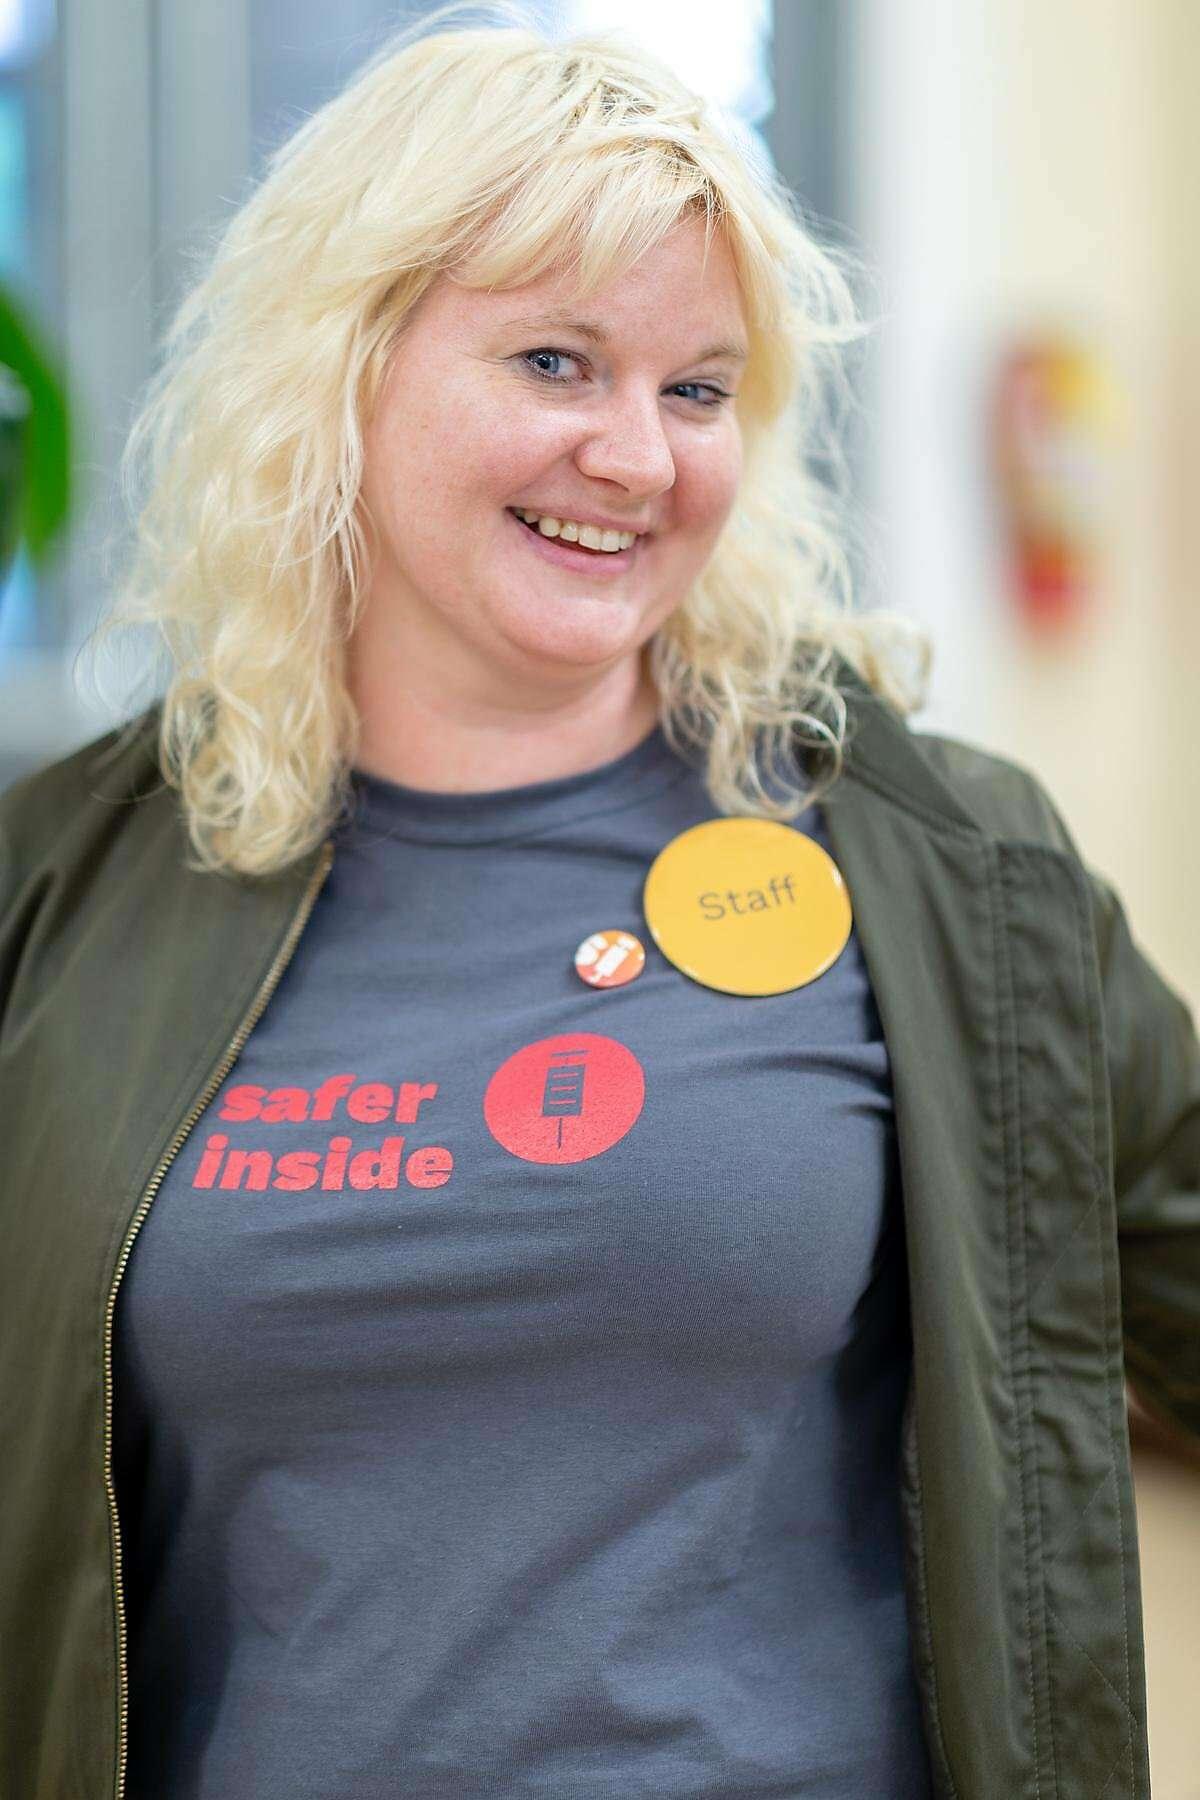 Injection site designer Jenny Kempson